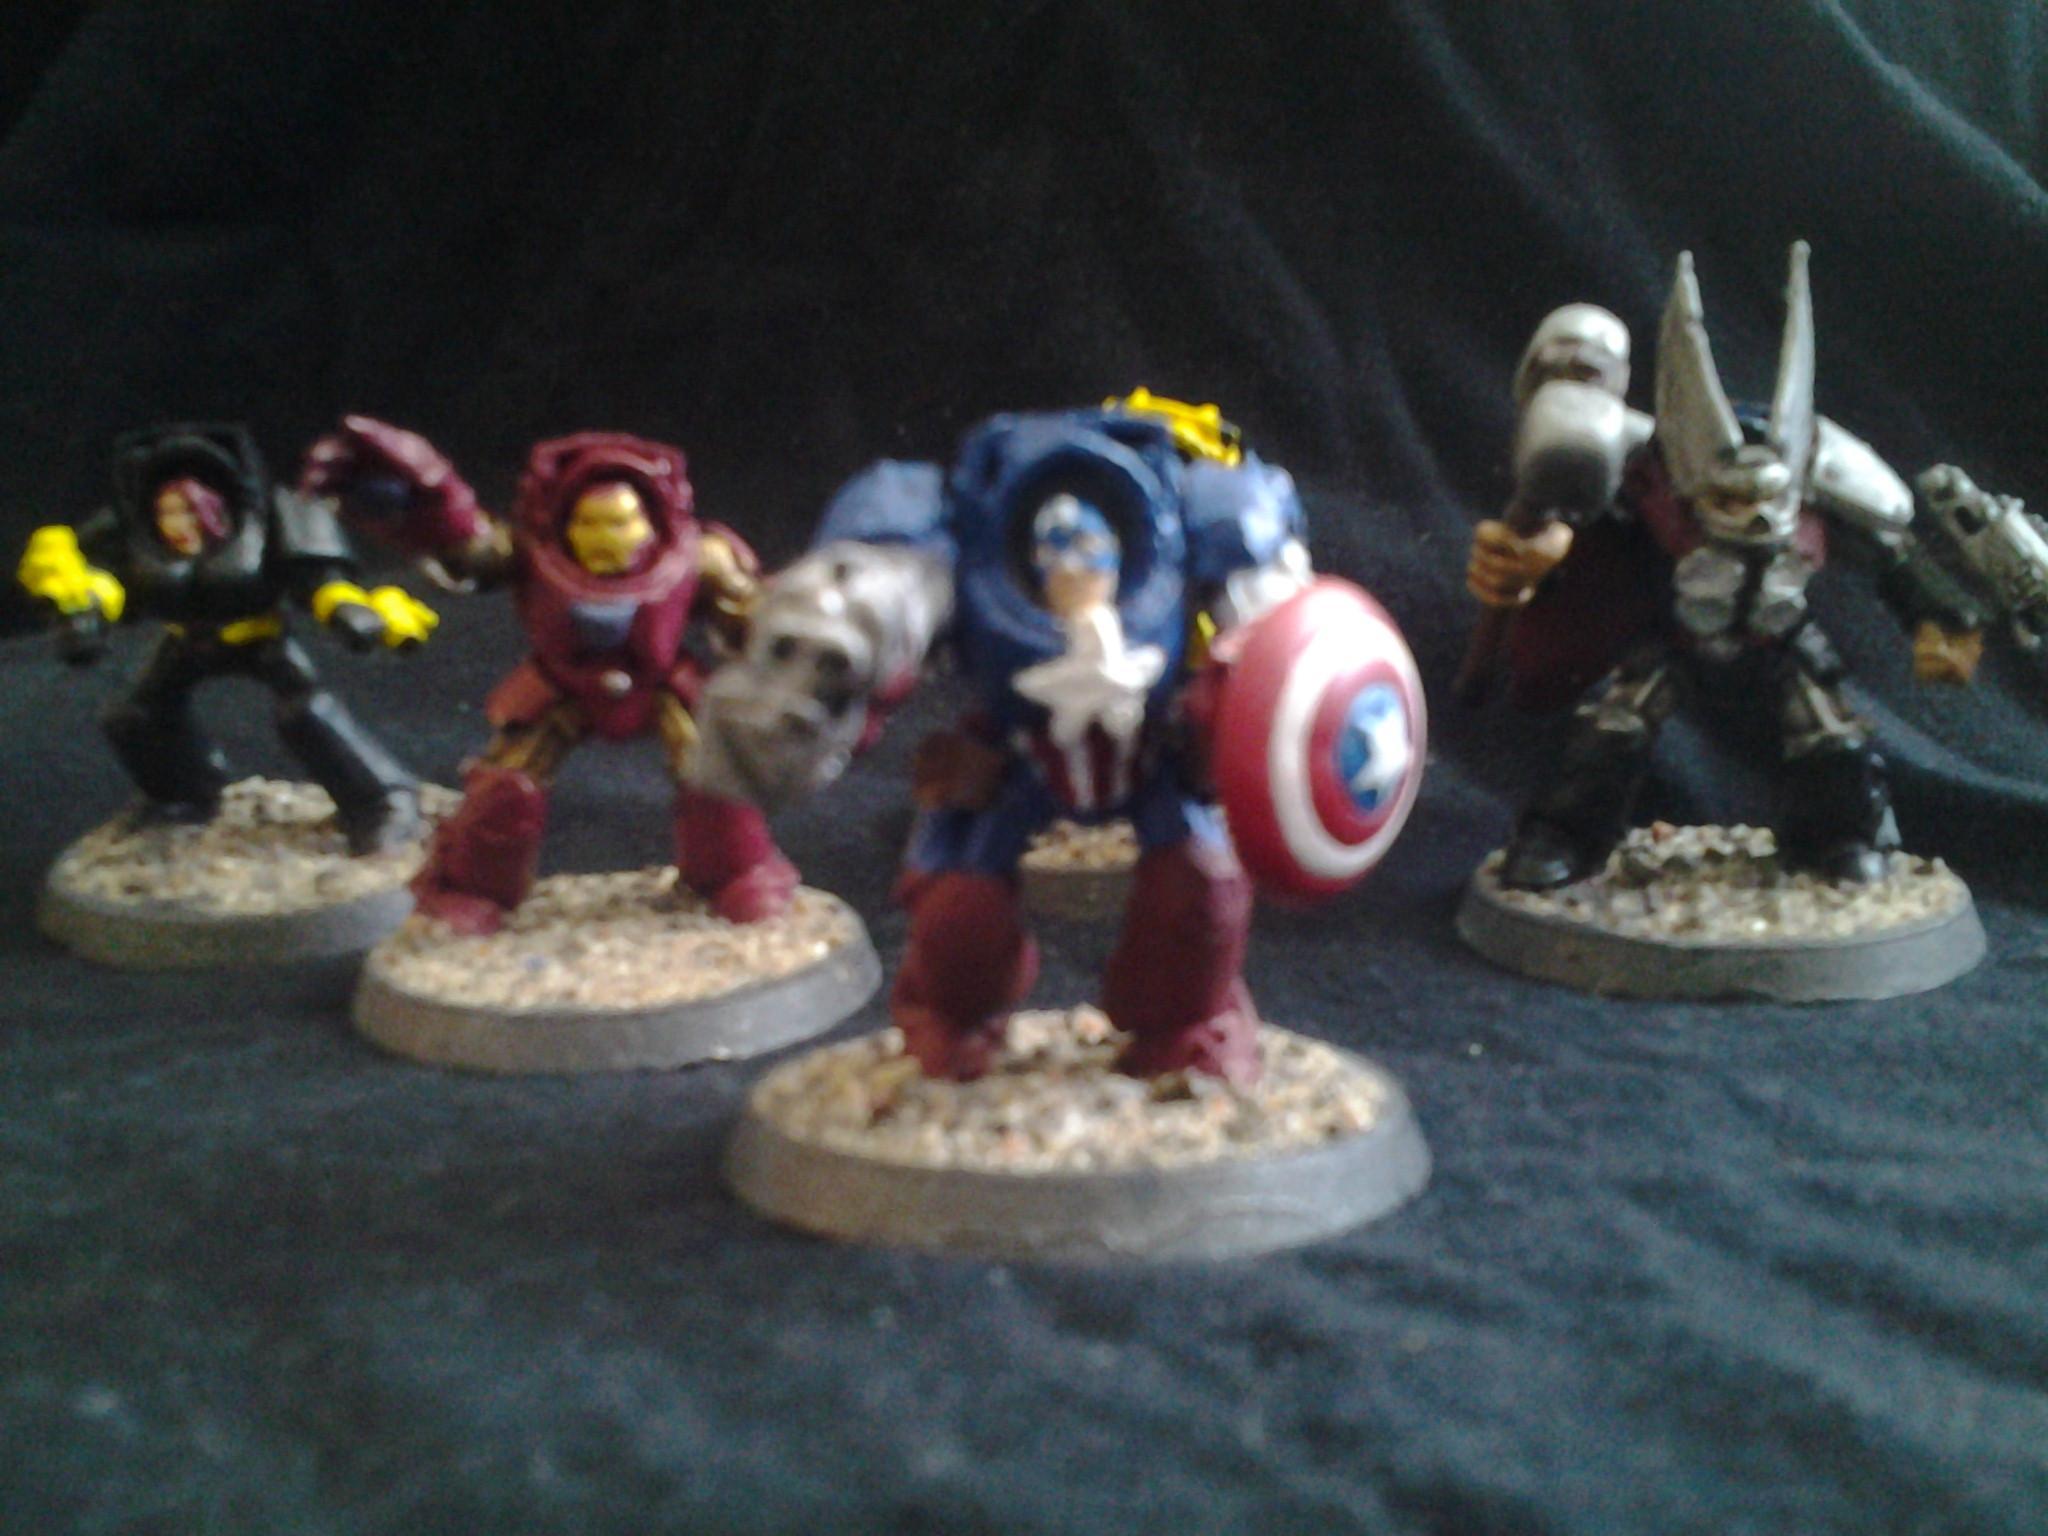 America, Avengers, Awesome, Black, Canadian, Captain, Conversion, Creative, Deadpool, Fun, Hammer, Iron, Man, Marvel, Space Marines, Superheros, Terminator Armor, Thor, Widow, Wolverine